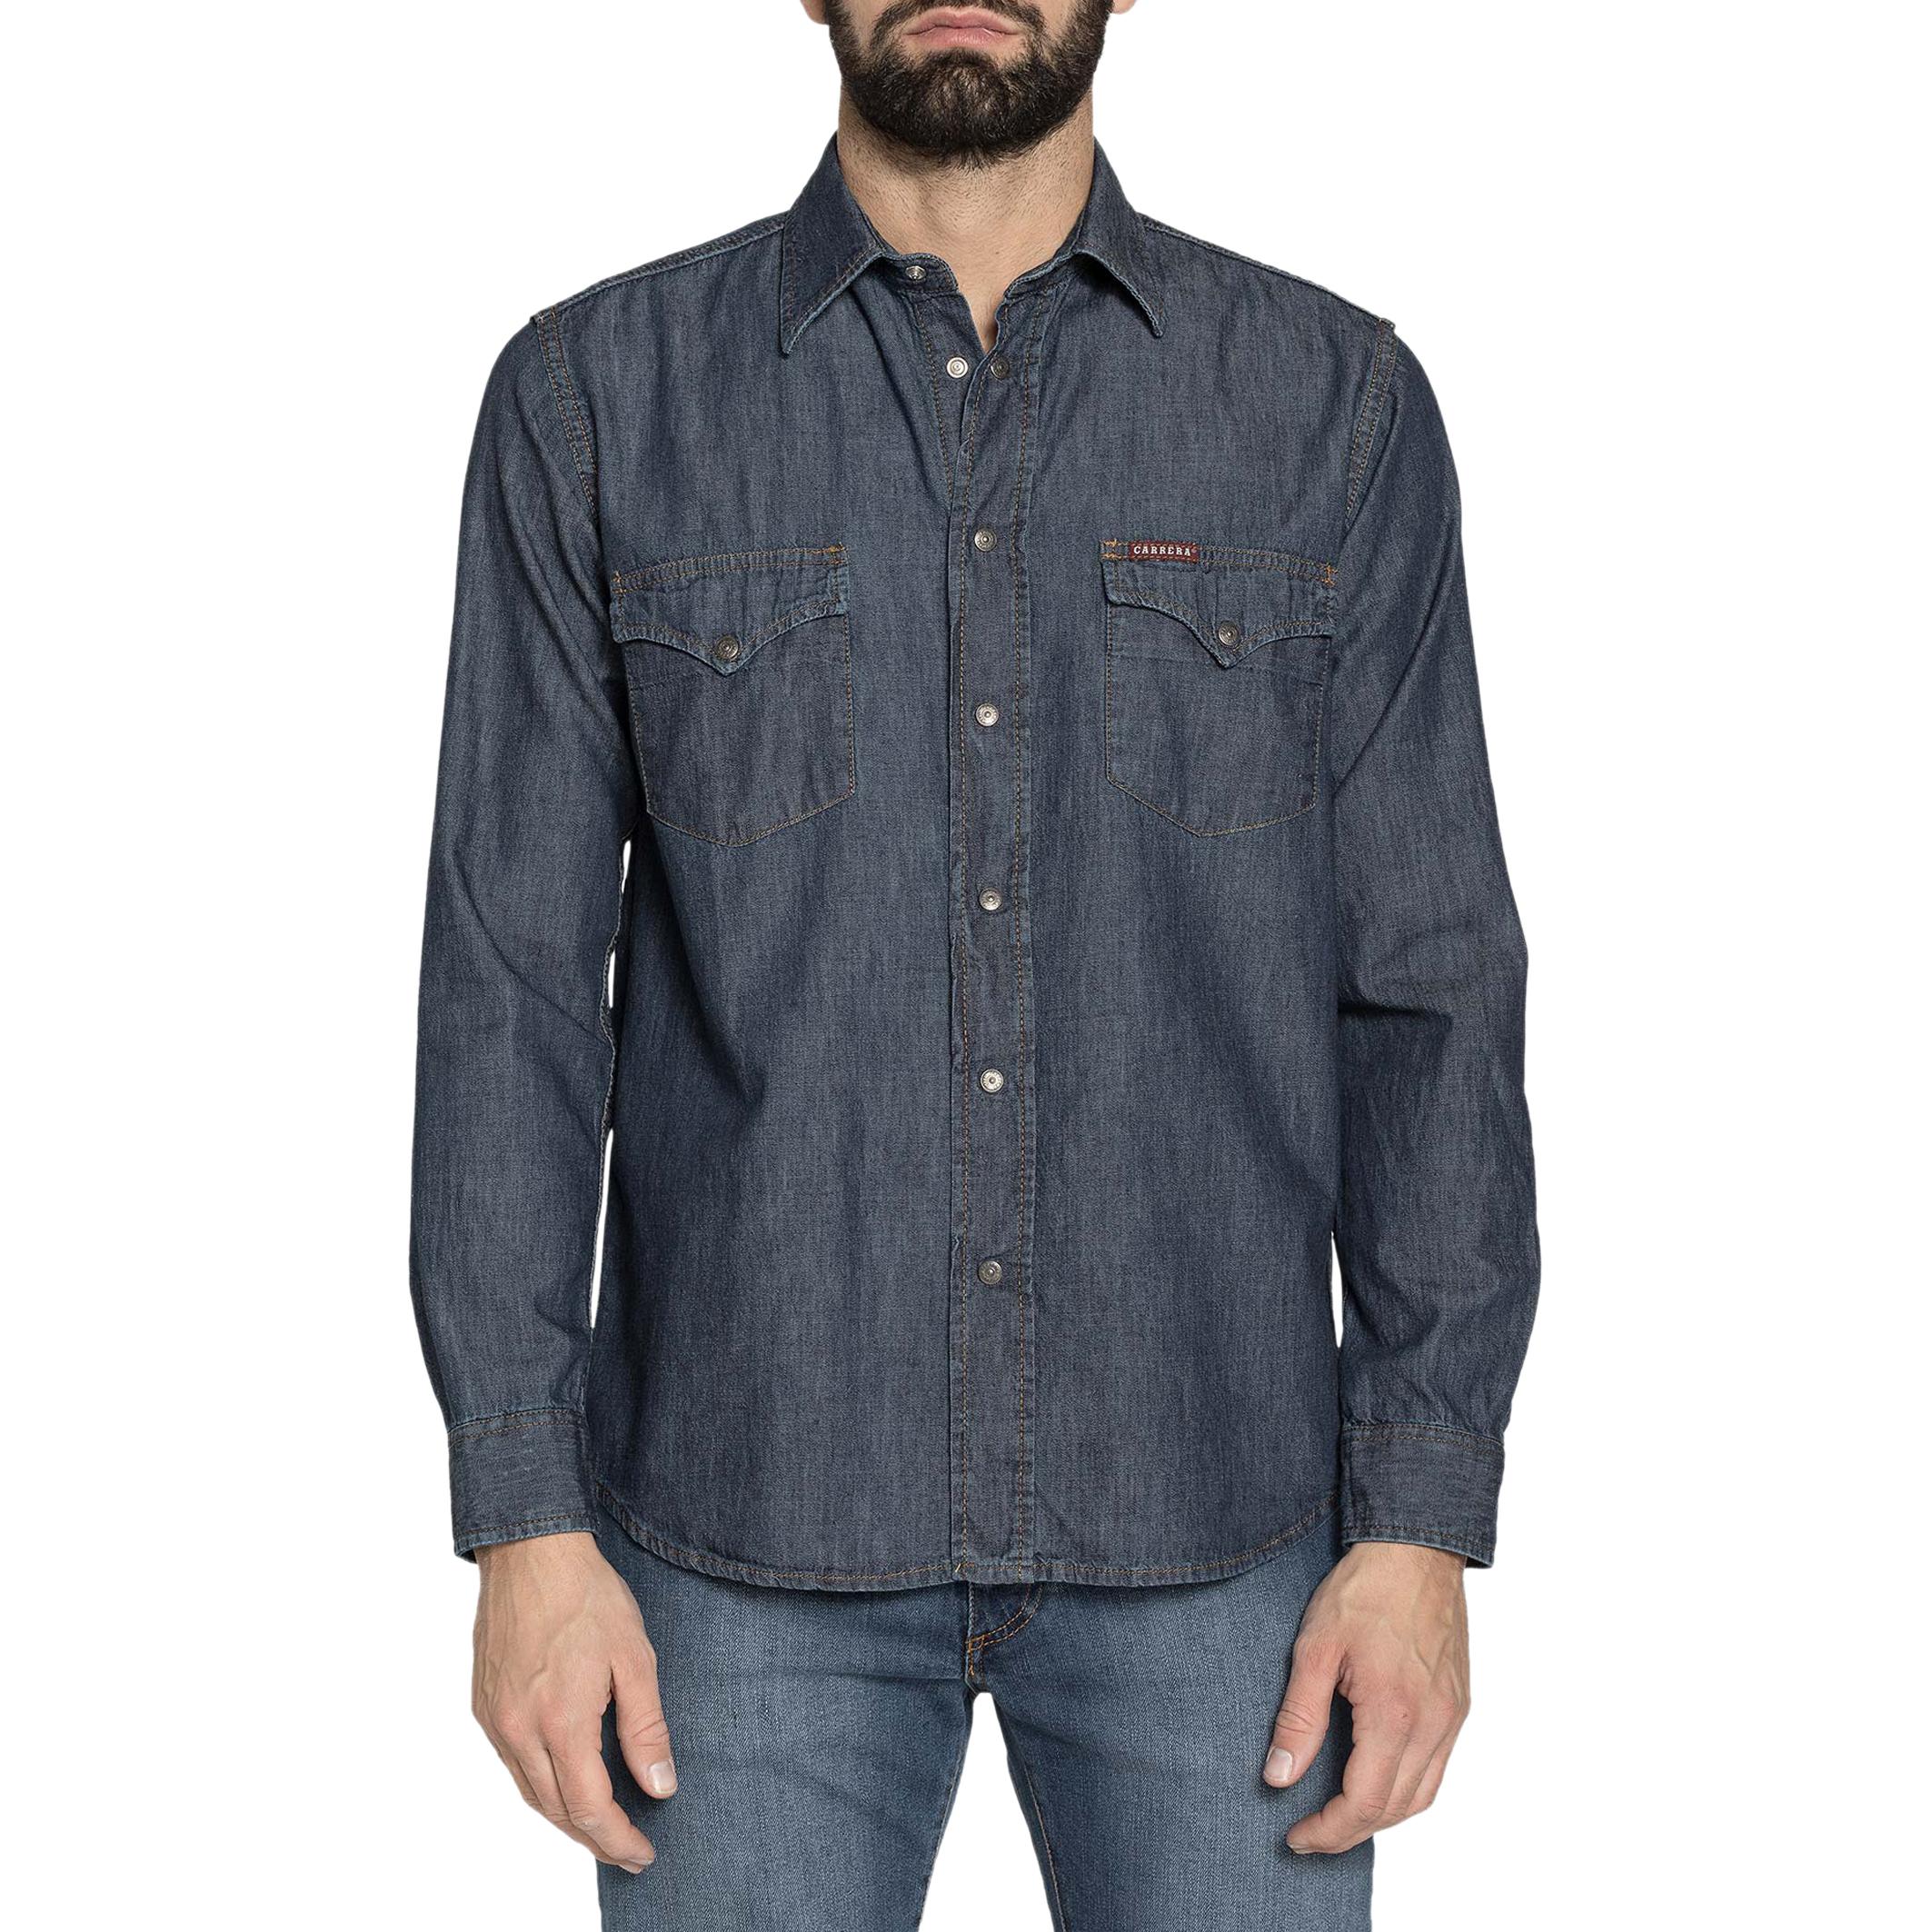 Carrera Jeans 205-1005A